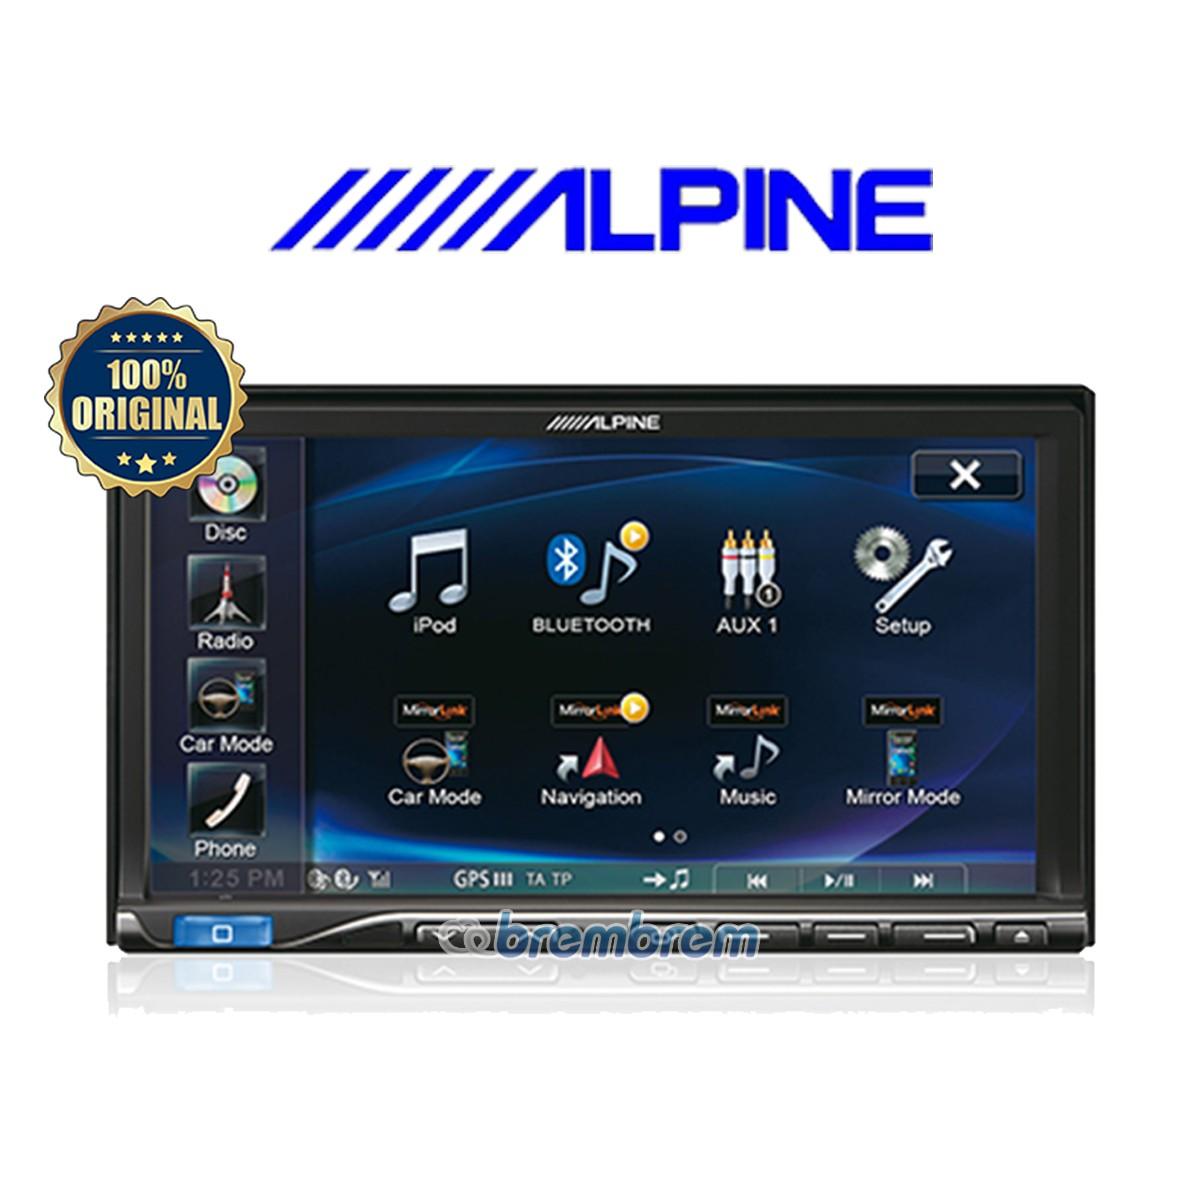 ALPINE ICS X8 - HEADUNIT DOUBLE DIN